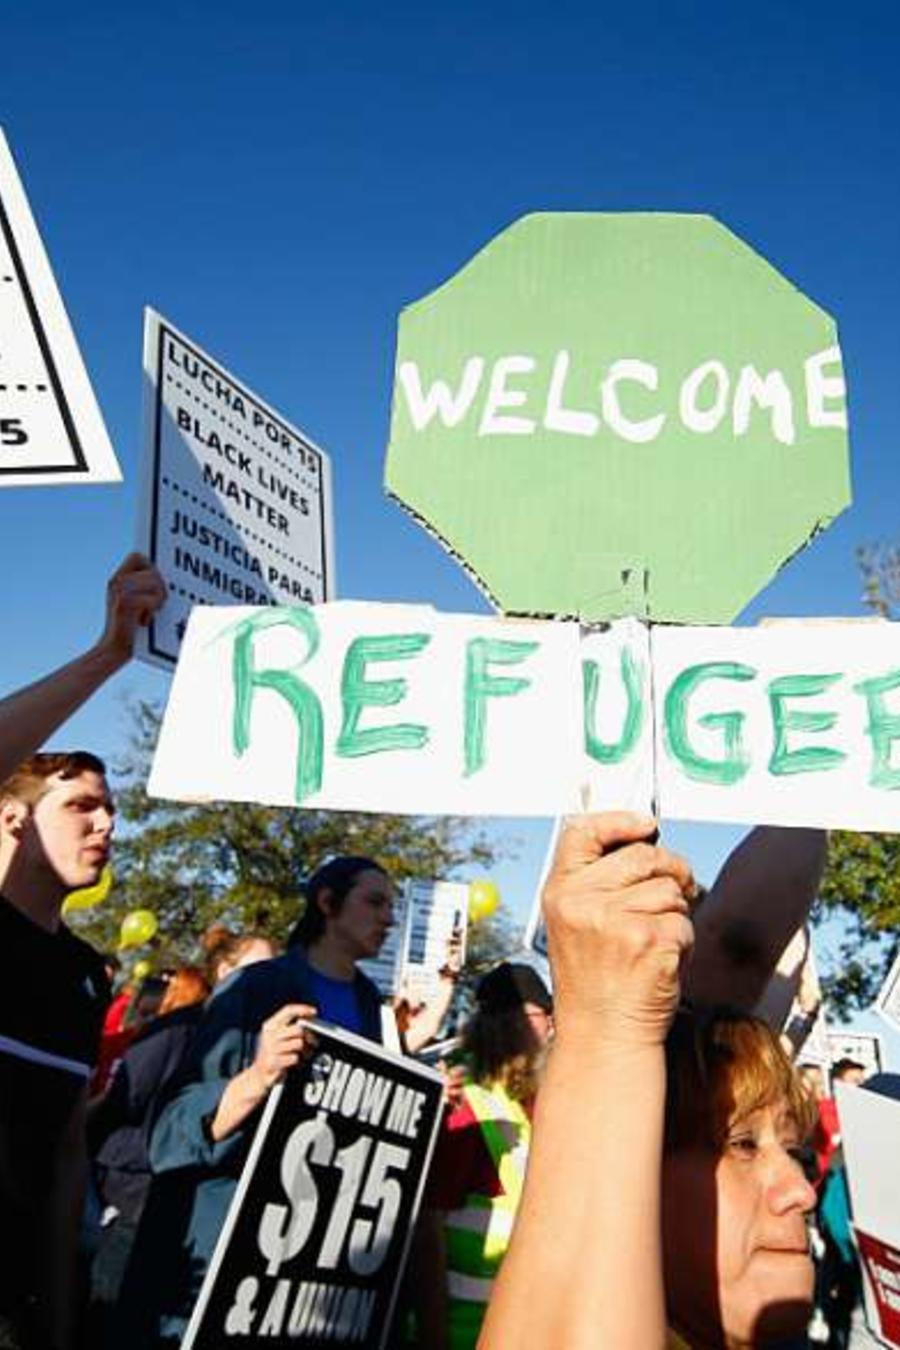 Buscan asilo de forma legal, y afrontan rechazo o terminan en centros de detención.